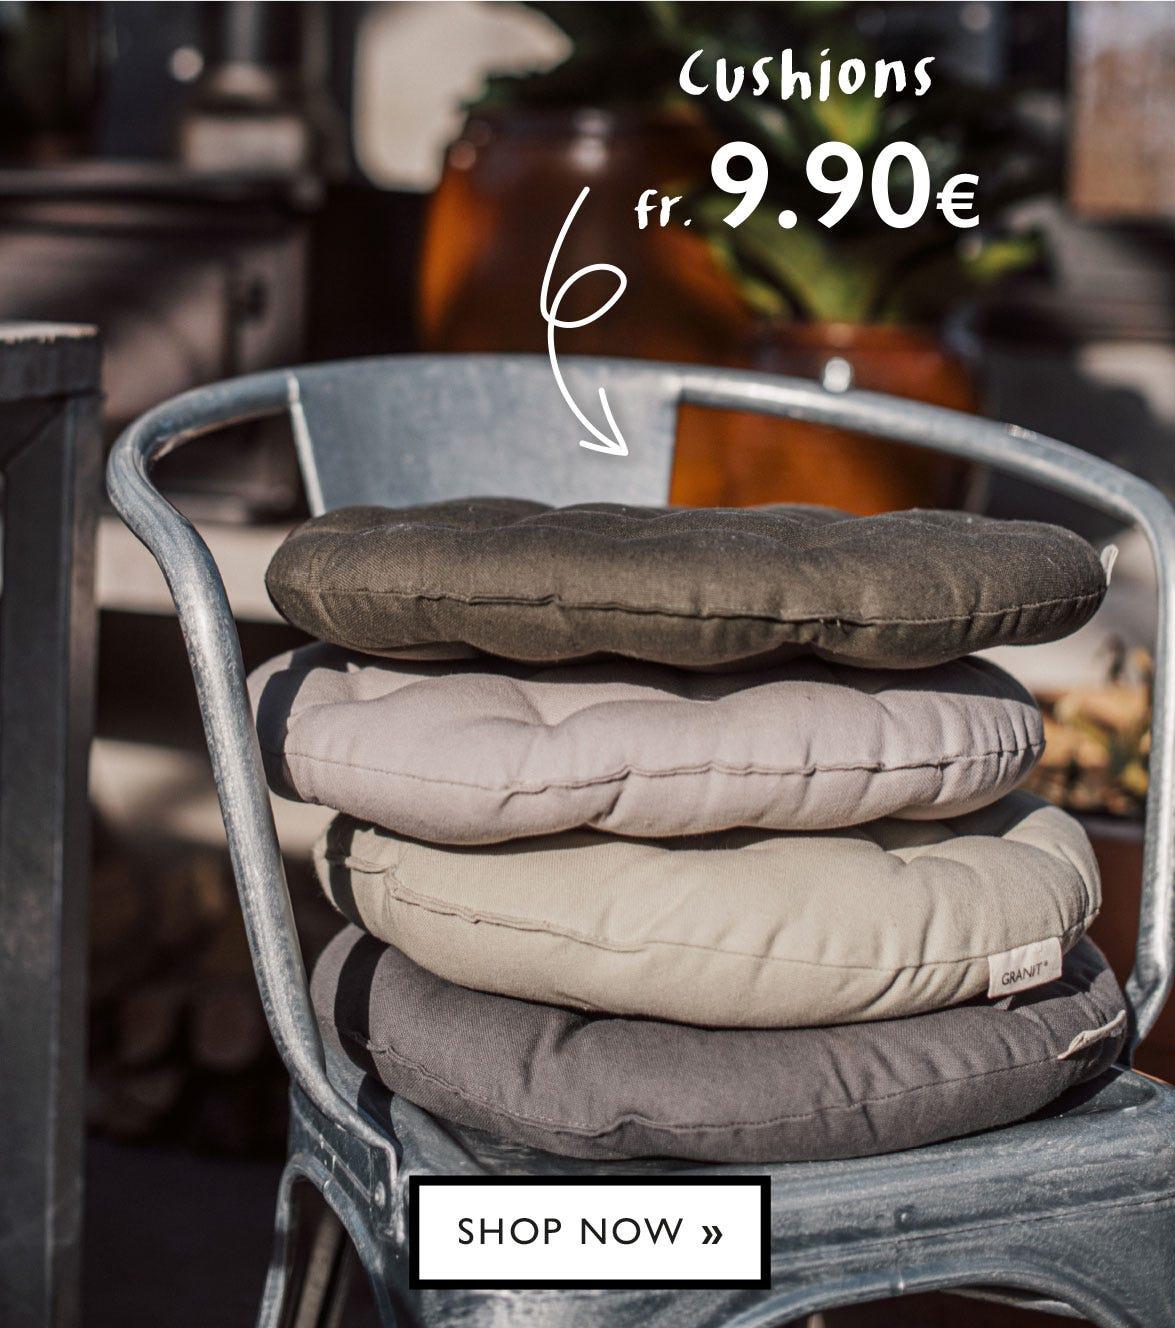 Seat cushions fr. 9.90 €